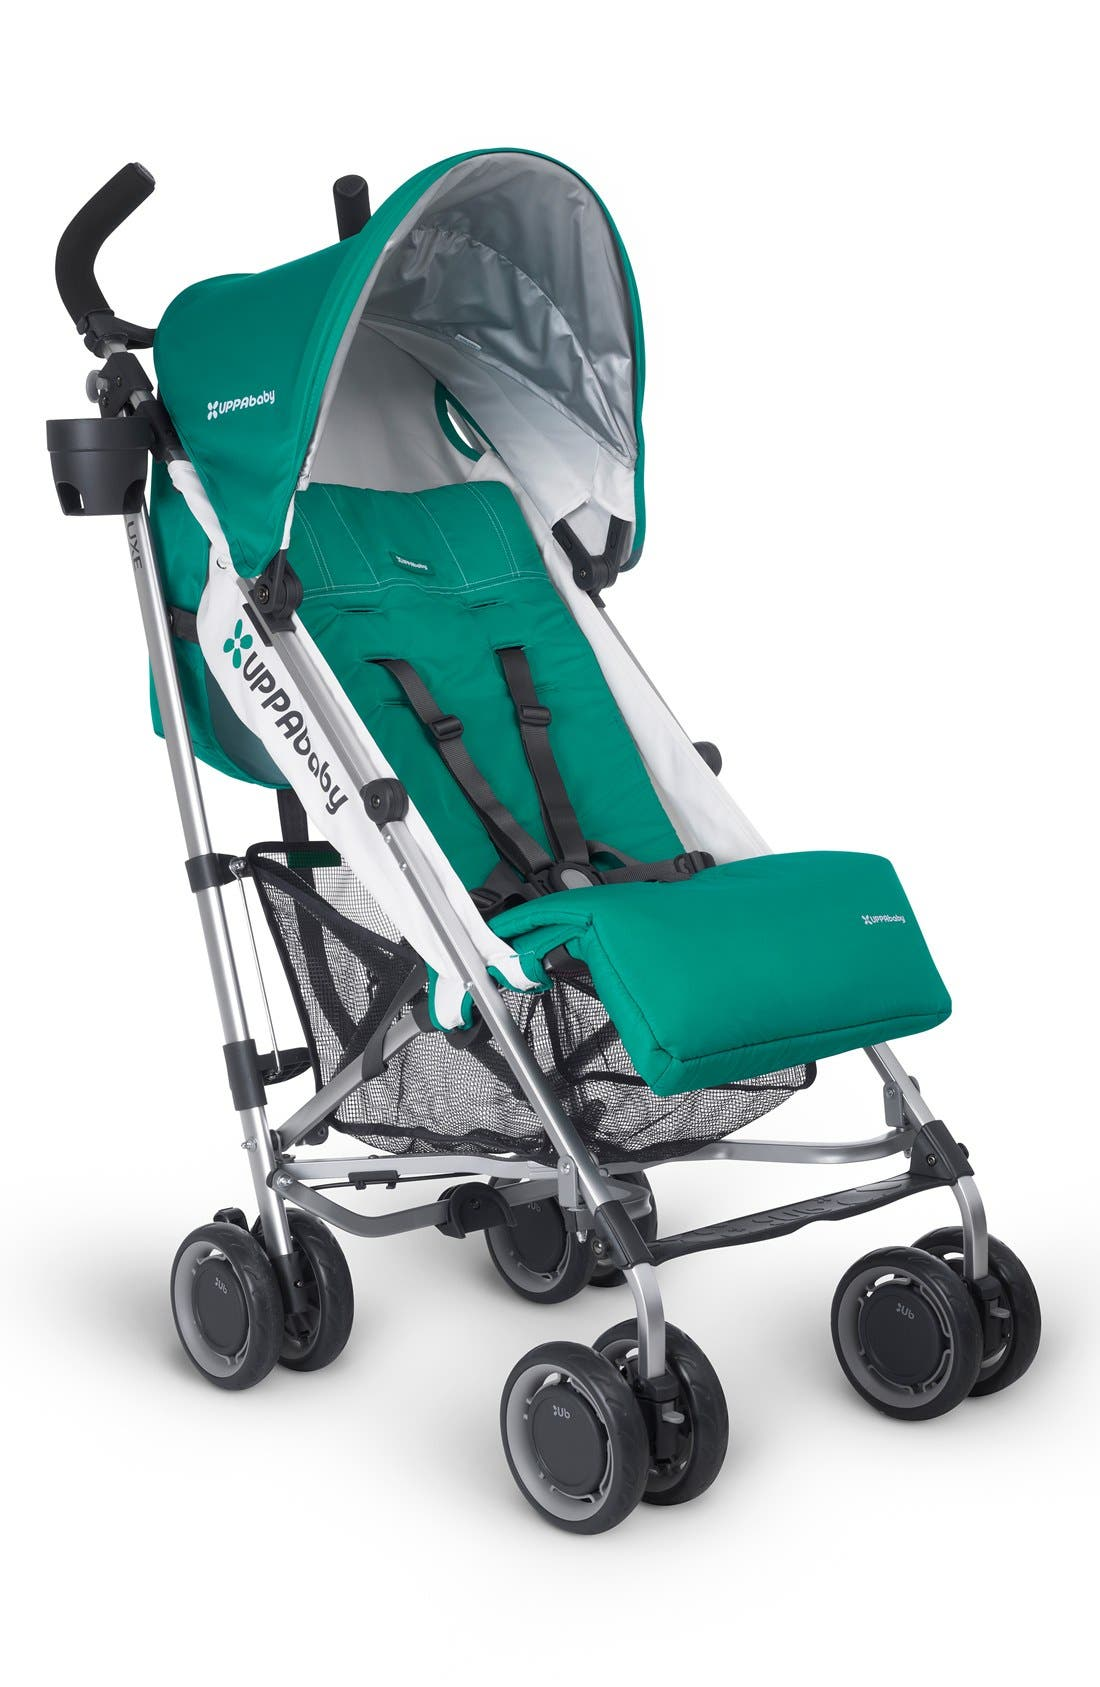 2015 G-LUXE - Aluminum Frame Reclining Umbrella Stroller,                             Main thumbnail 2, color,